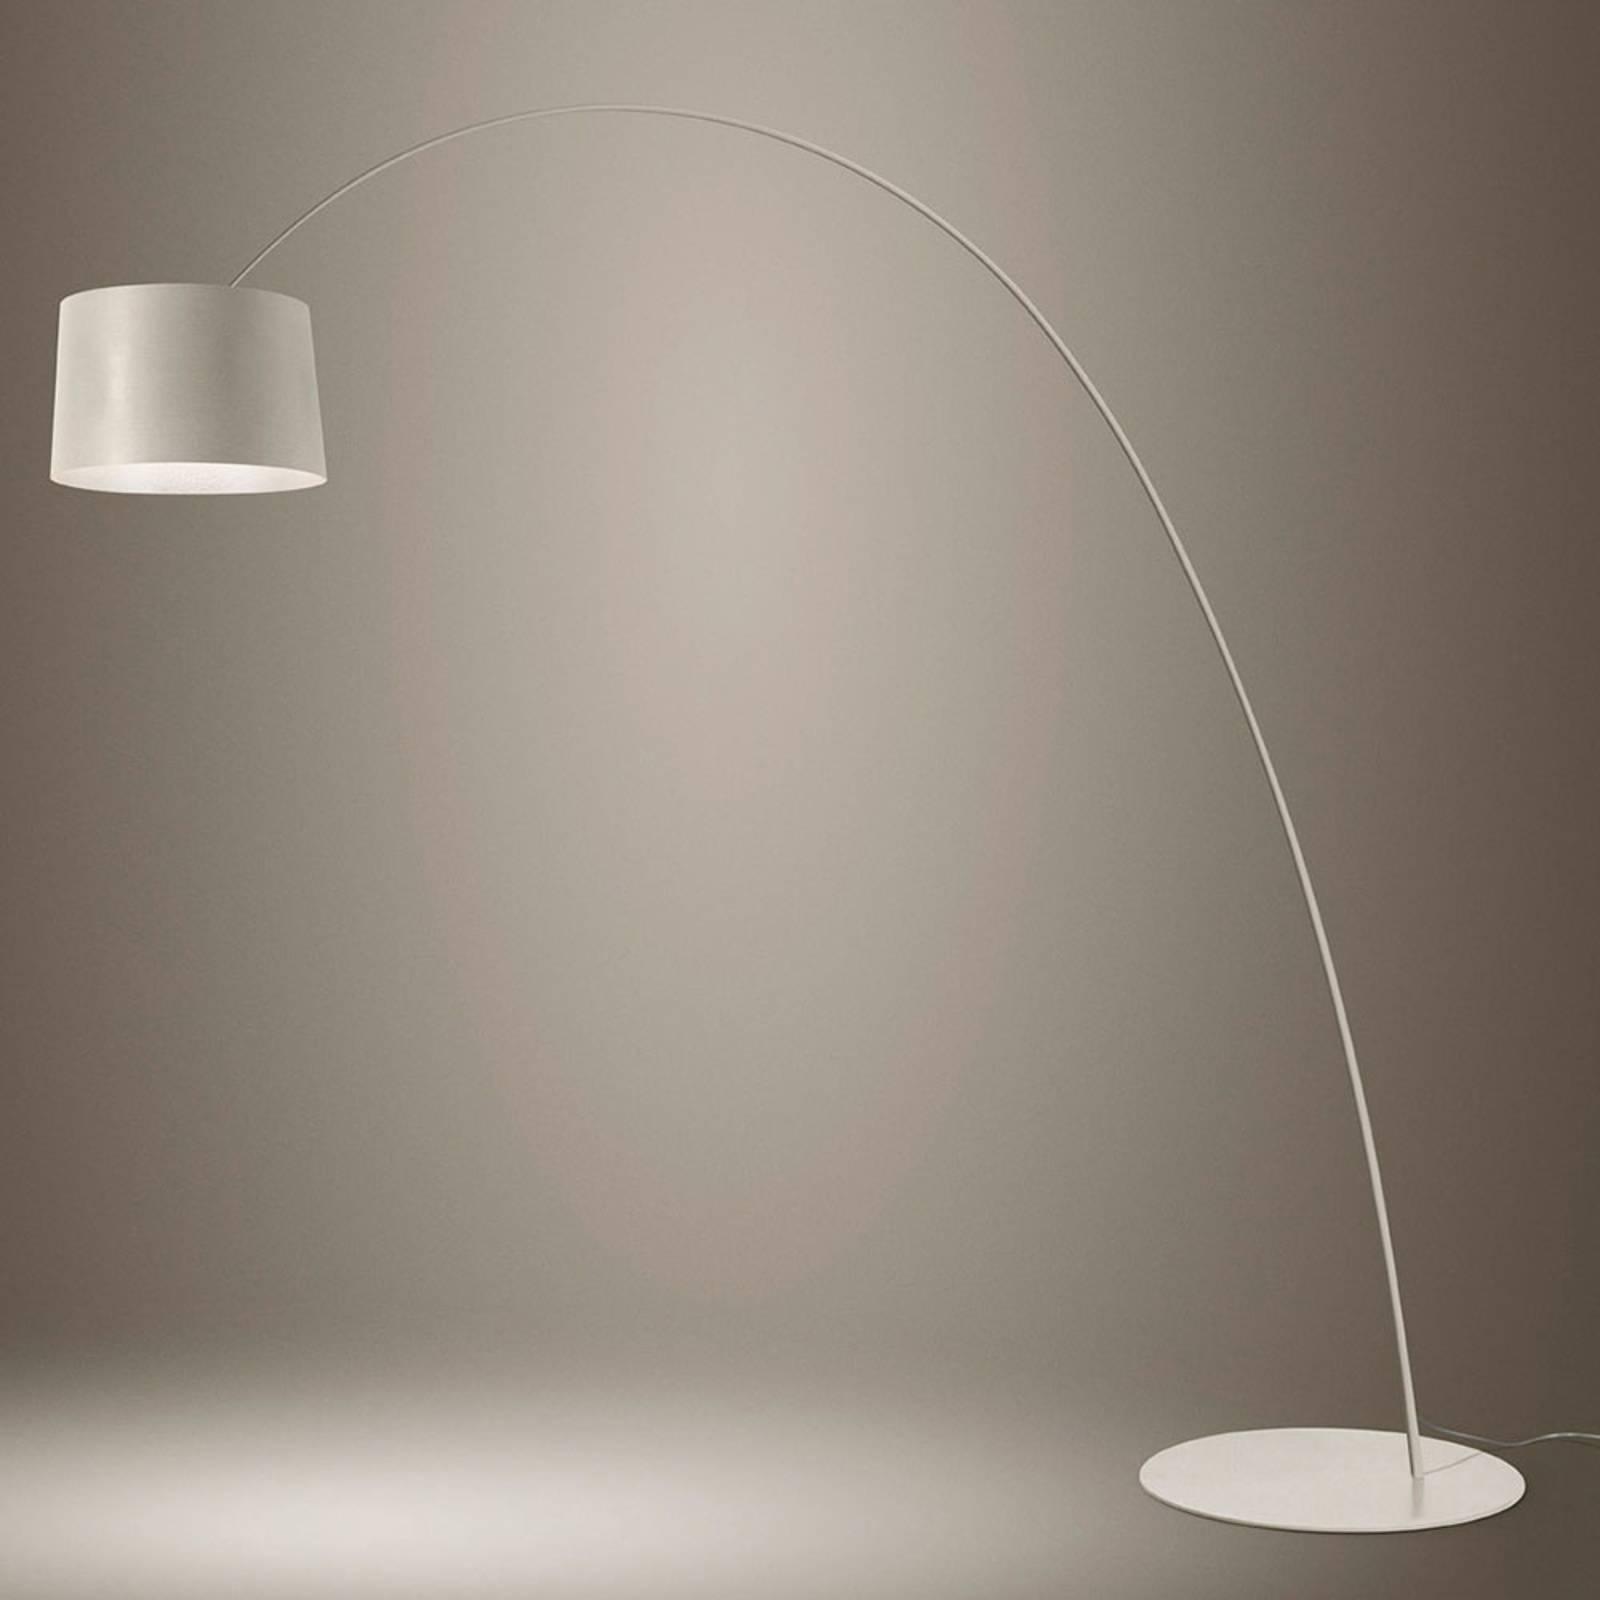 Foscarini Twiggy LED-Stehleuchte greige